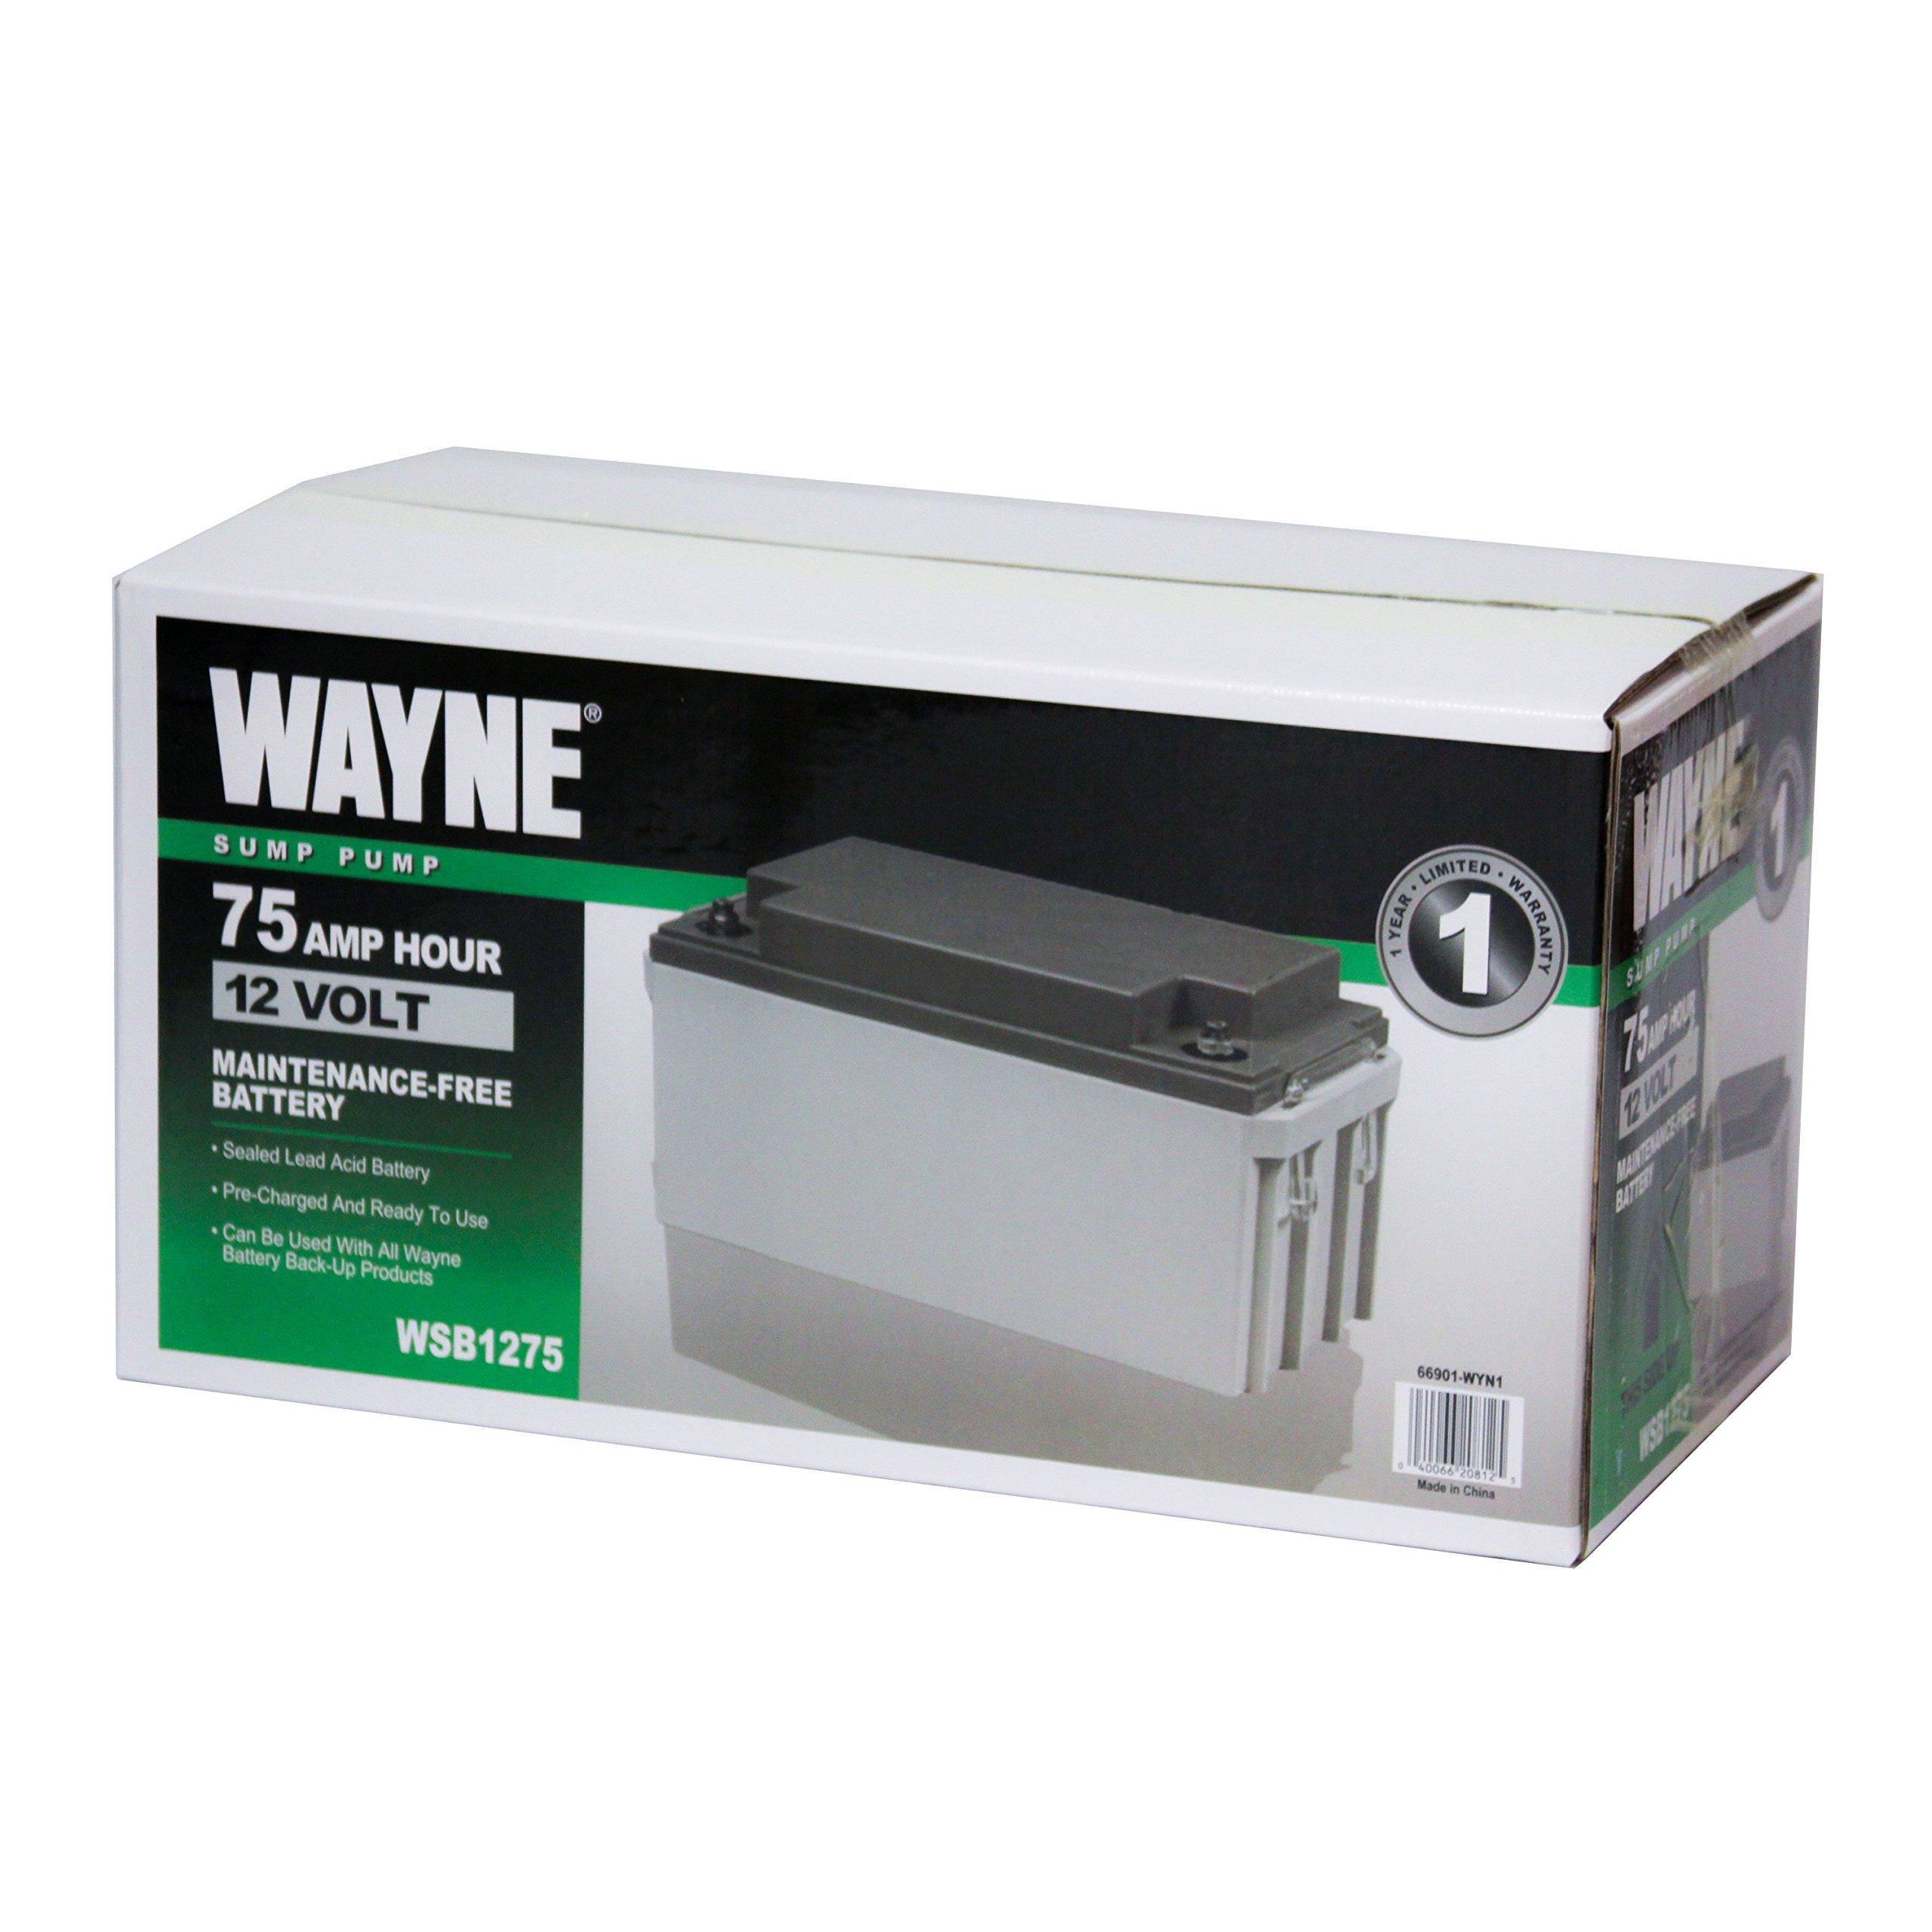 Wayne WSB1275 75Ah AGM Sealed Lead Acid Battery by Wayne